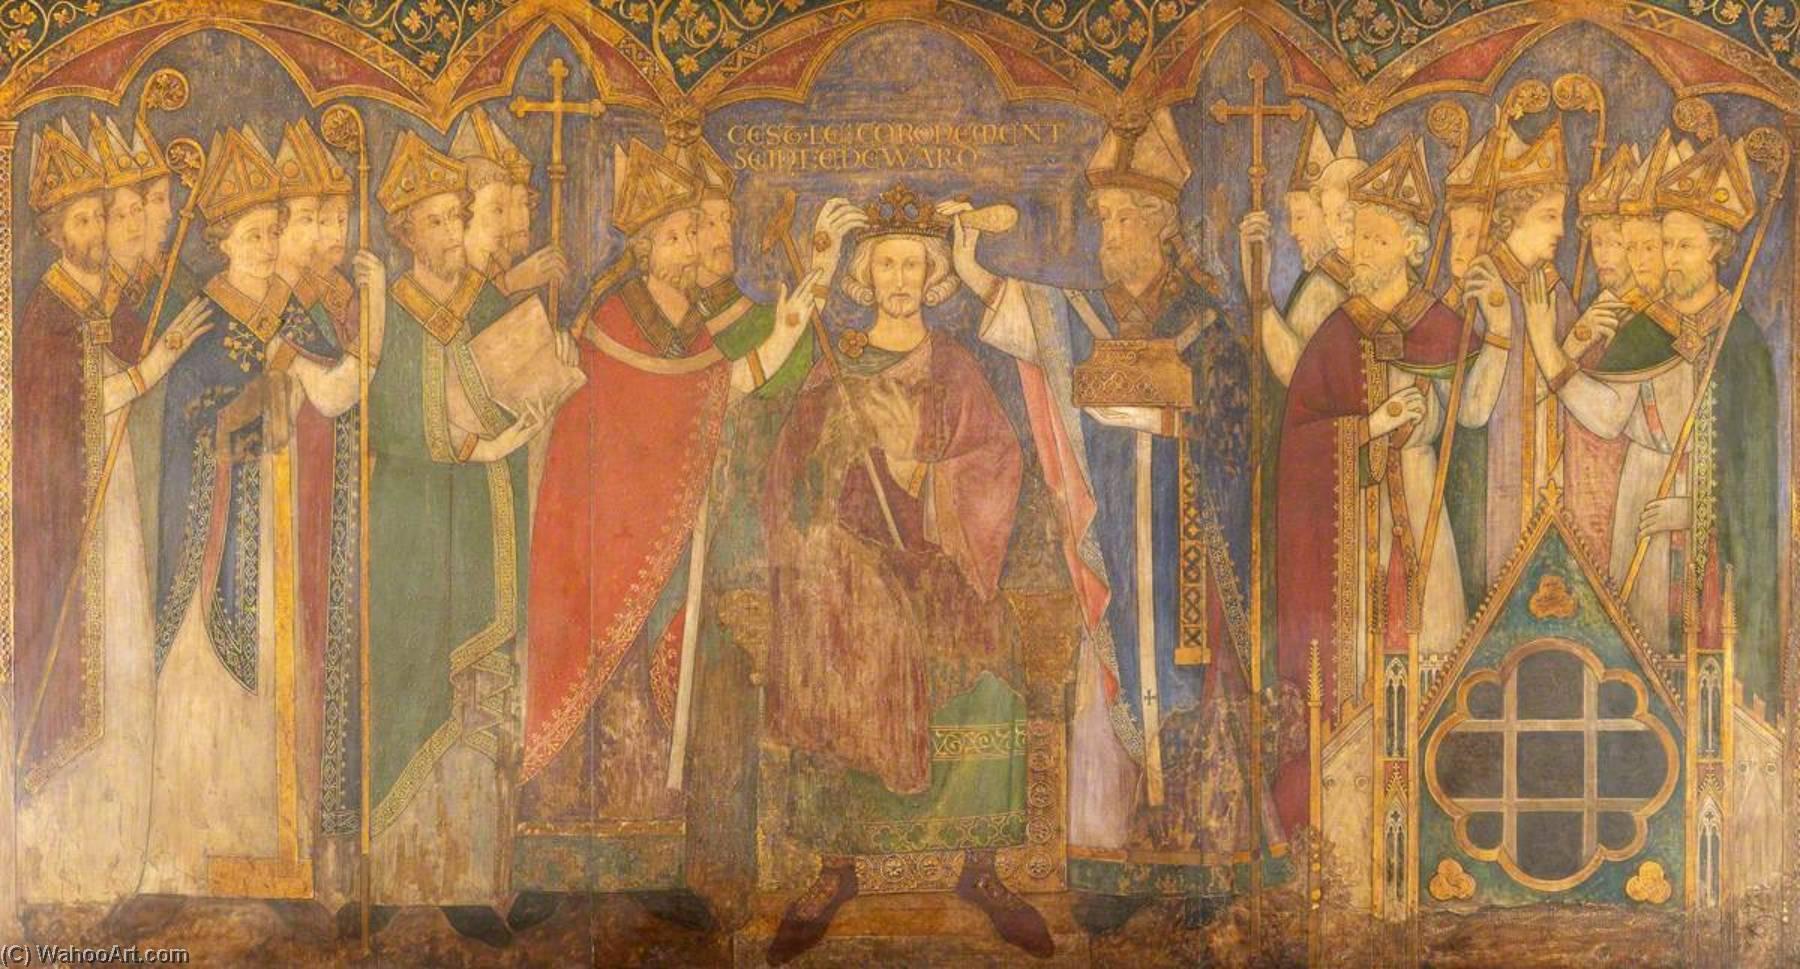 Ricostruzione Di Medievale Pittura Murale Incoronazione Di Edward Il Confessore Di Ernest William Tristram Stampe Di Qualita Del Museo Most Famous Paintings Com